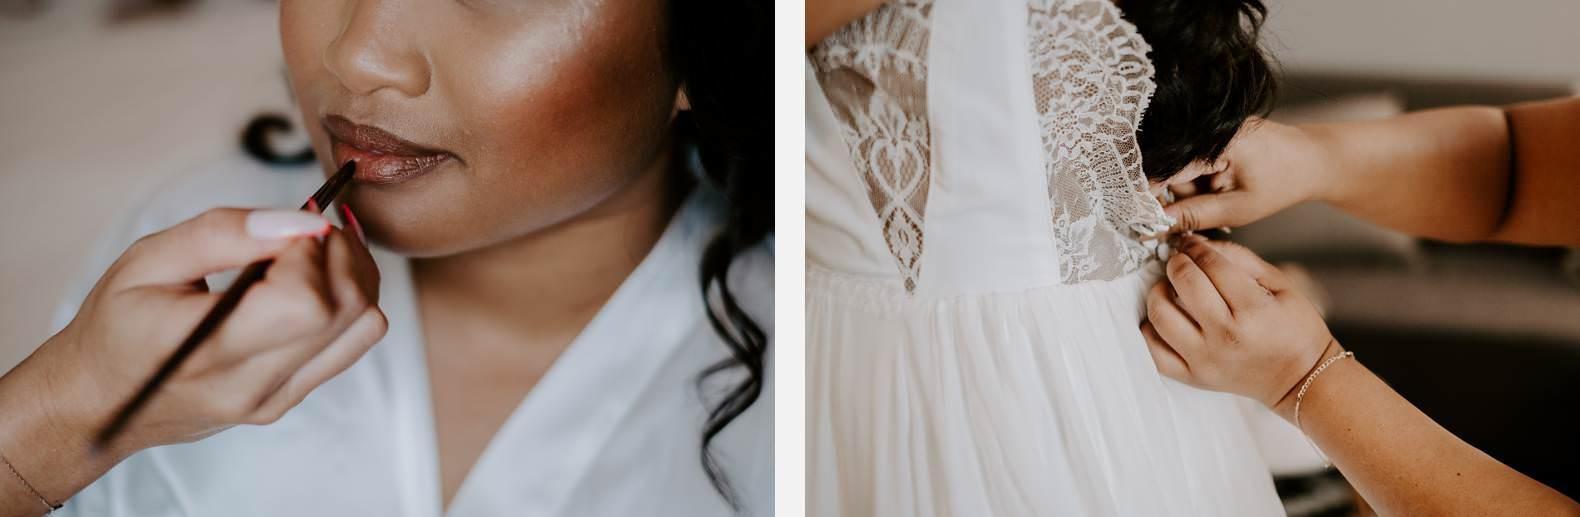 mariage manoir de corny photographe bel esprit 0003 1